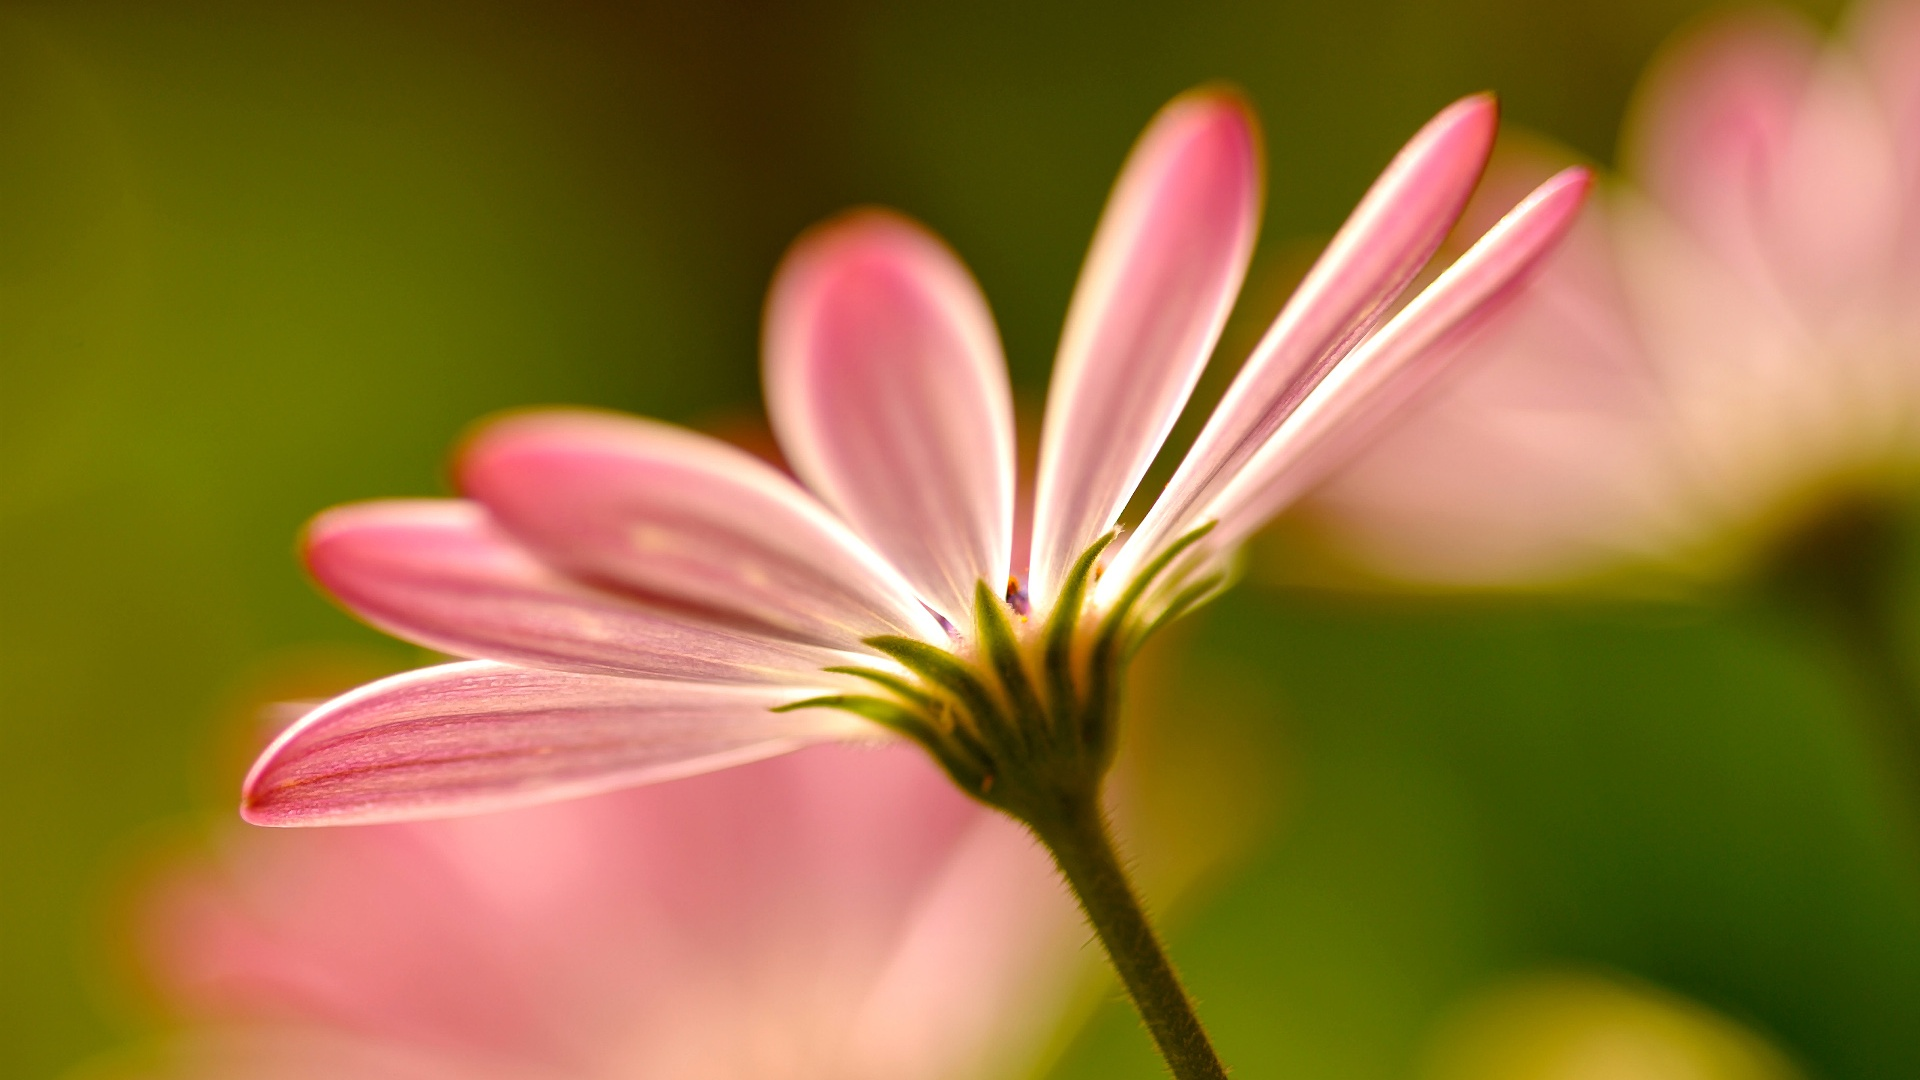 Pink flower petals macro photography Wallpaper | 1920x1080 ...